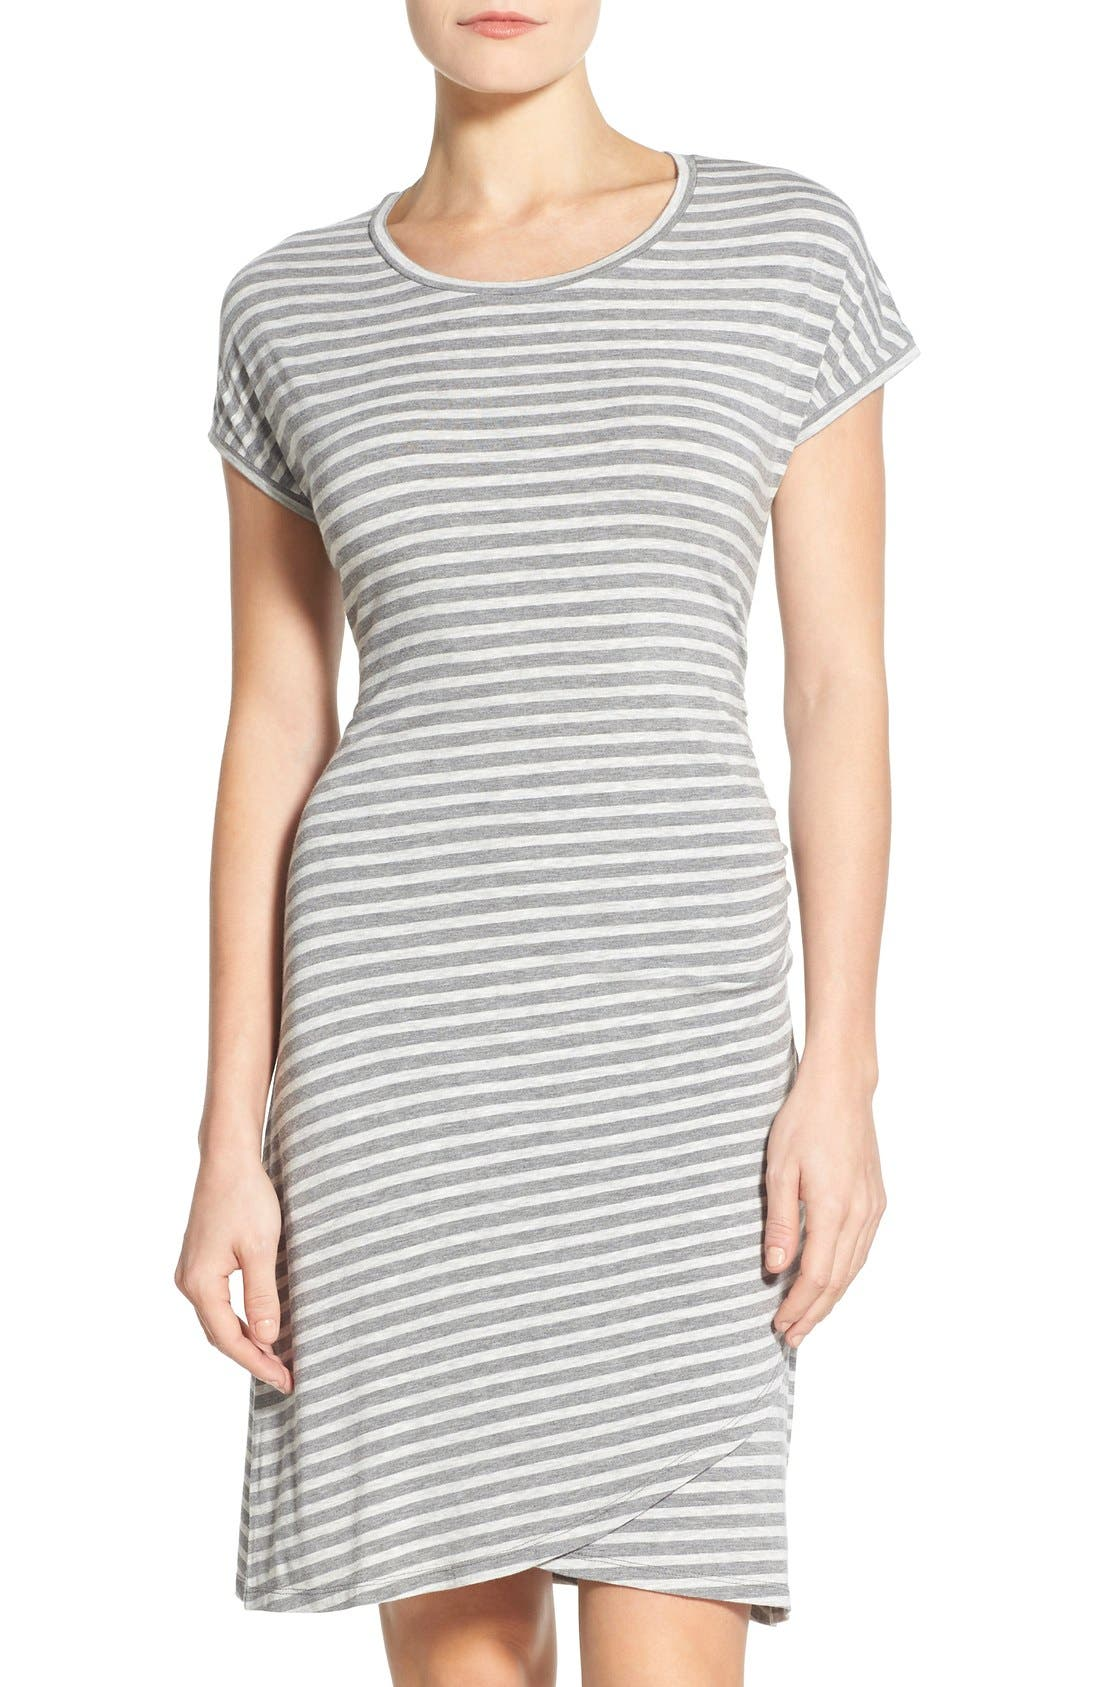 Main Image - Caslon® 'Growover' Jersey T-Shirt Dress